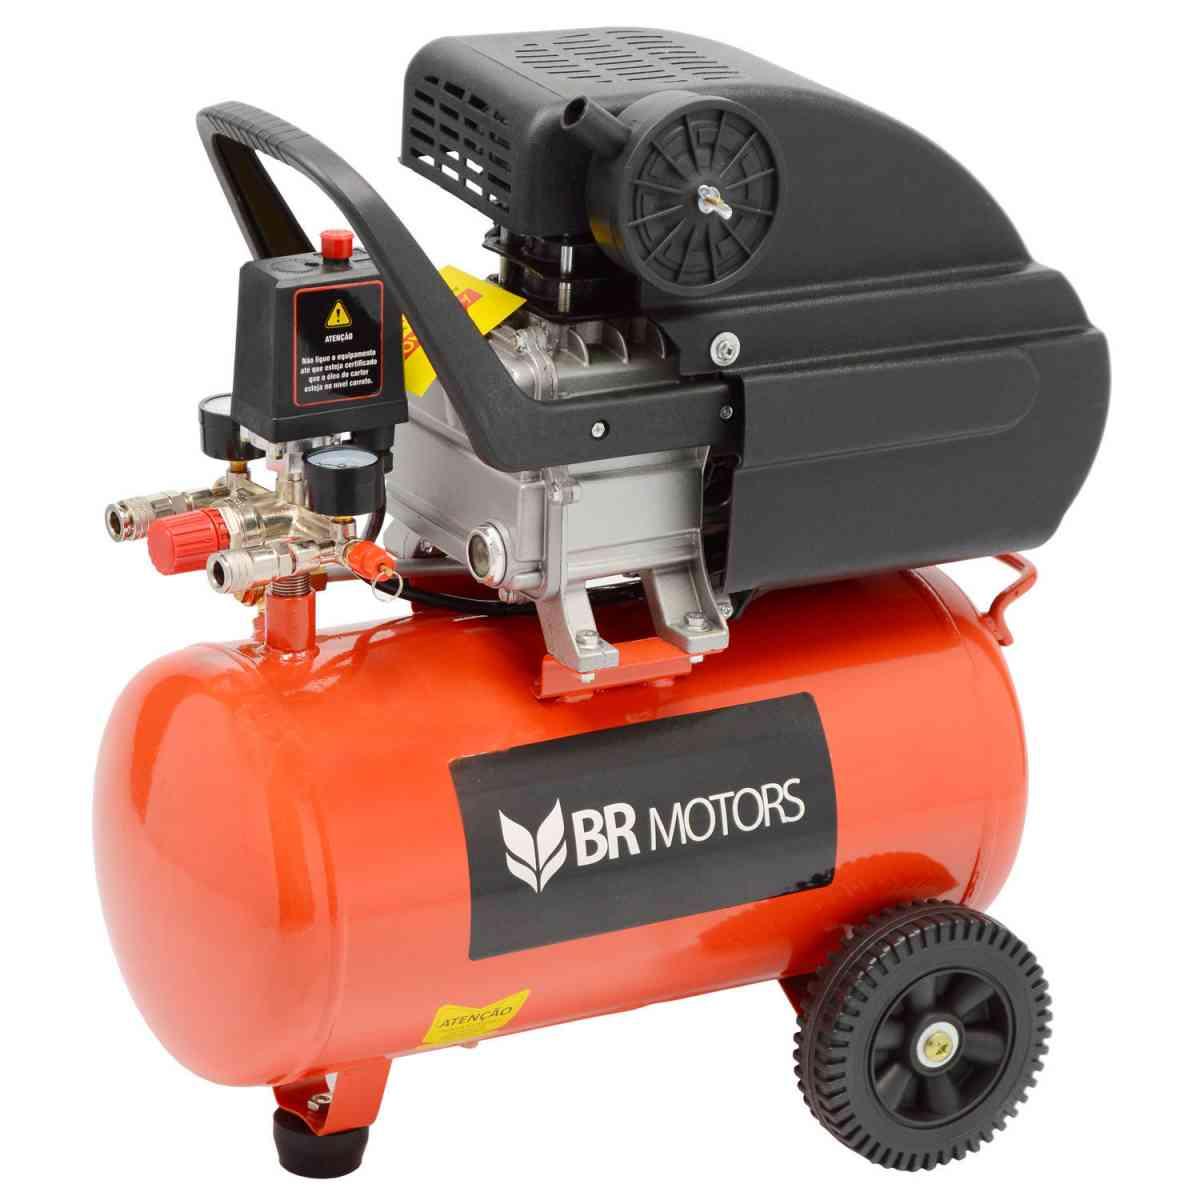 Compressor RDC 8.8 PCM 24 Litros Com Kit Br Motors - 127V